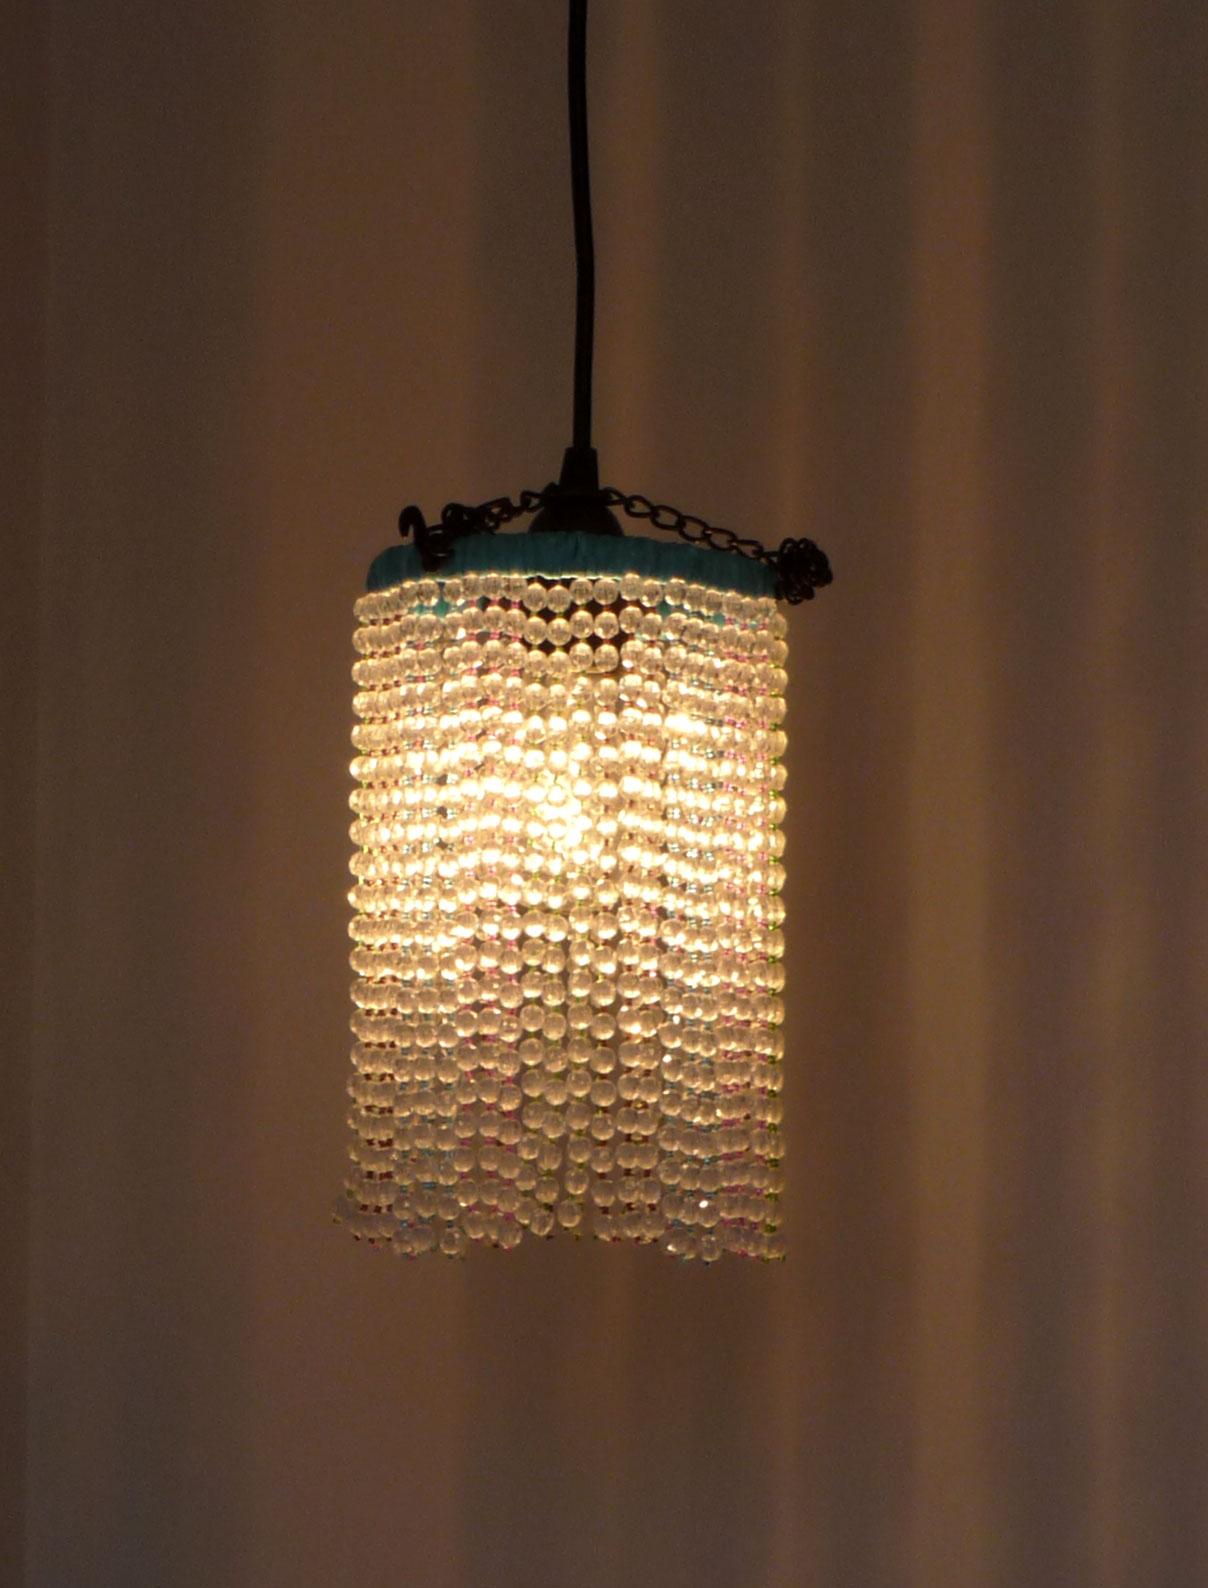 Aka carolyn project blog diy lighting challenge 1 for Diy crystal chandelier lamp